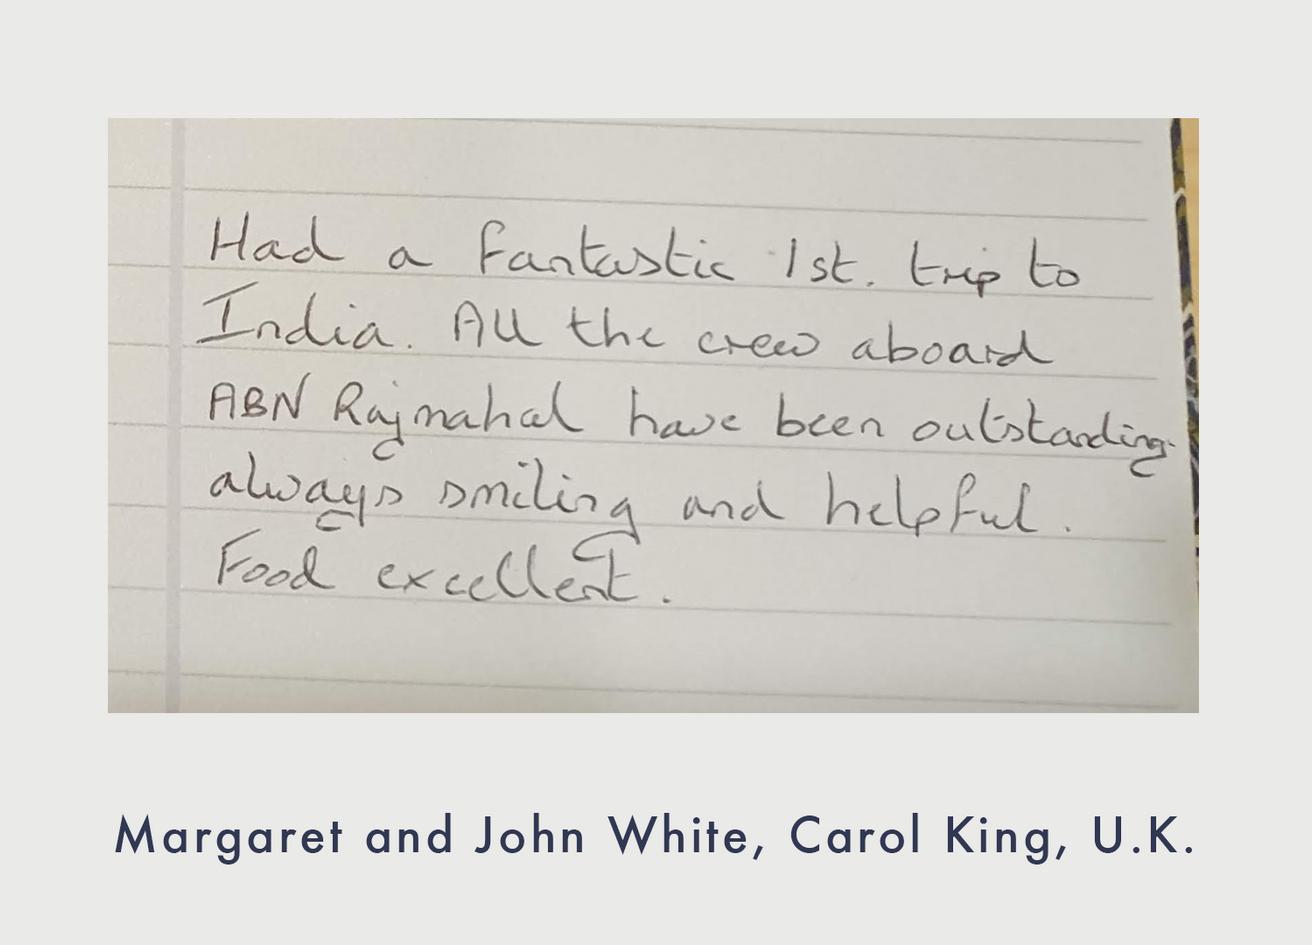 margaret and john white.png